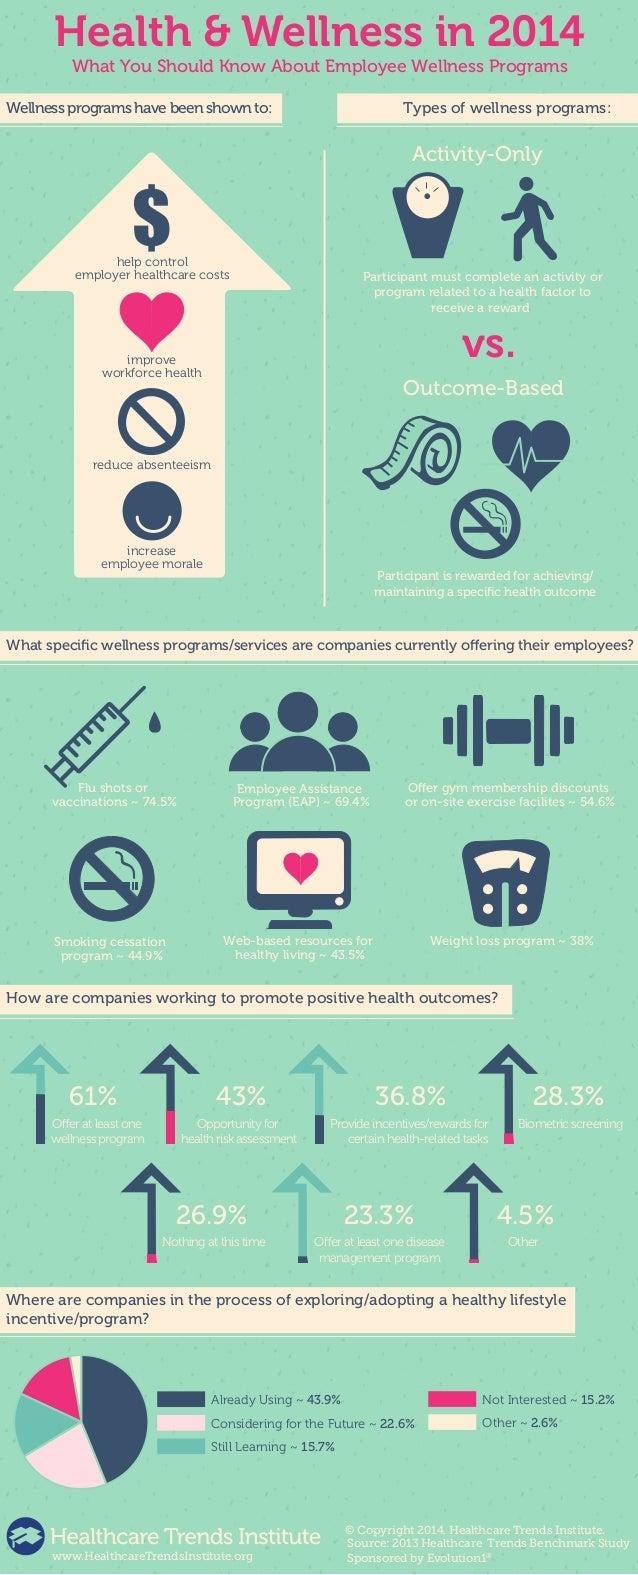 Employee Wellness Programs in 2014 Infographic